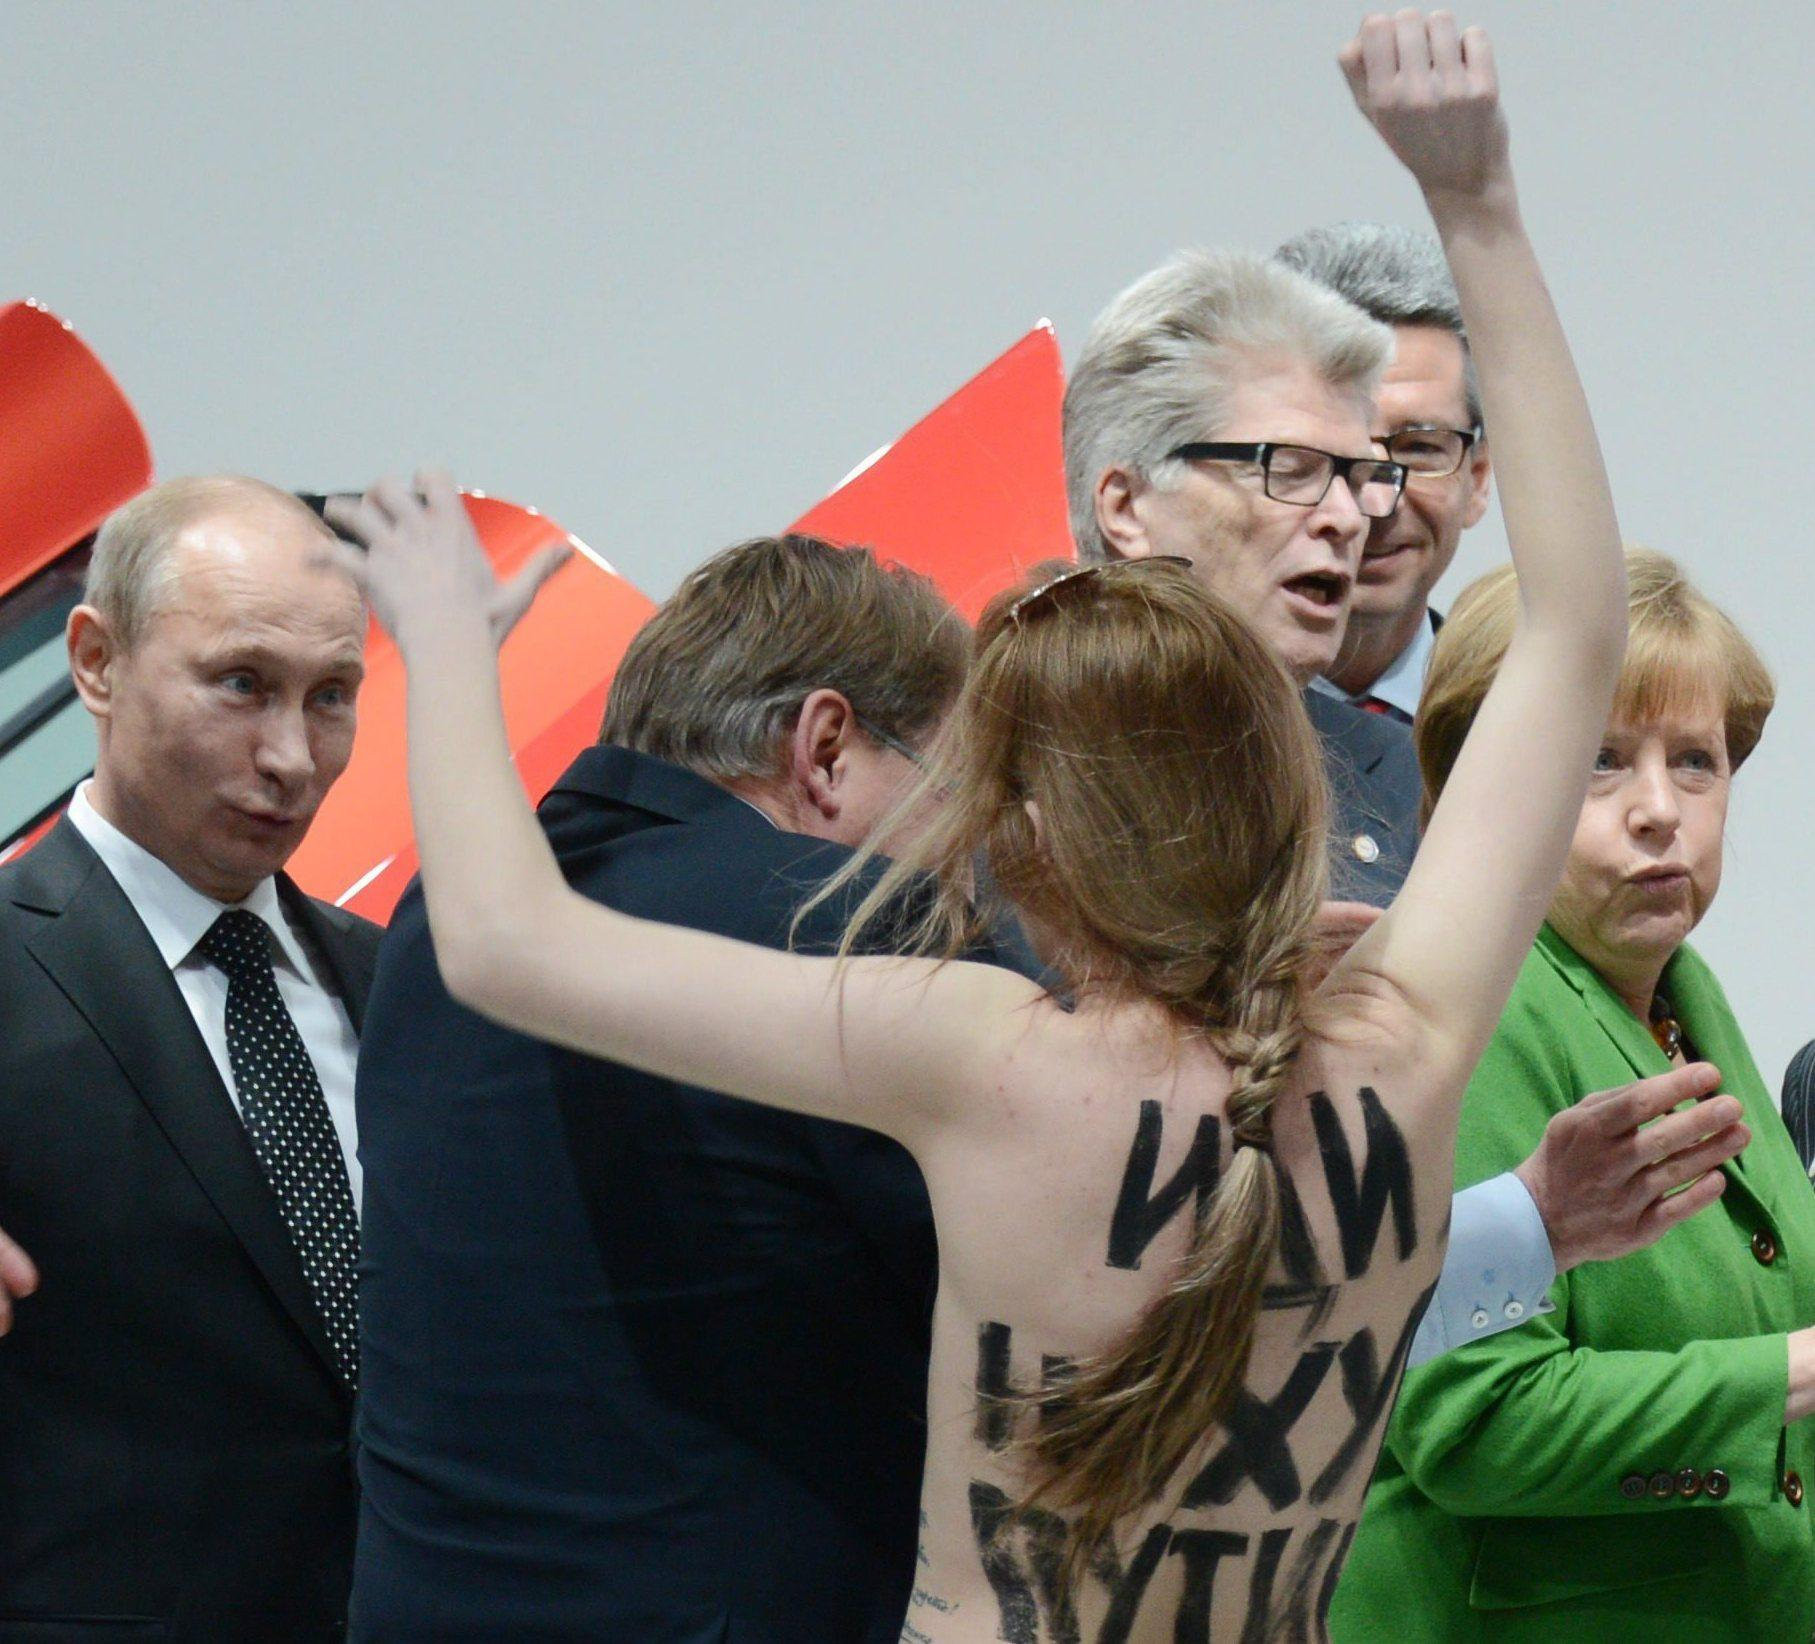 Angela Merkel Topless i liked it,' putin says of protesttopless women   mtpr